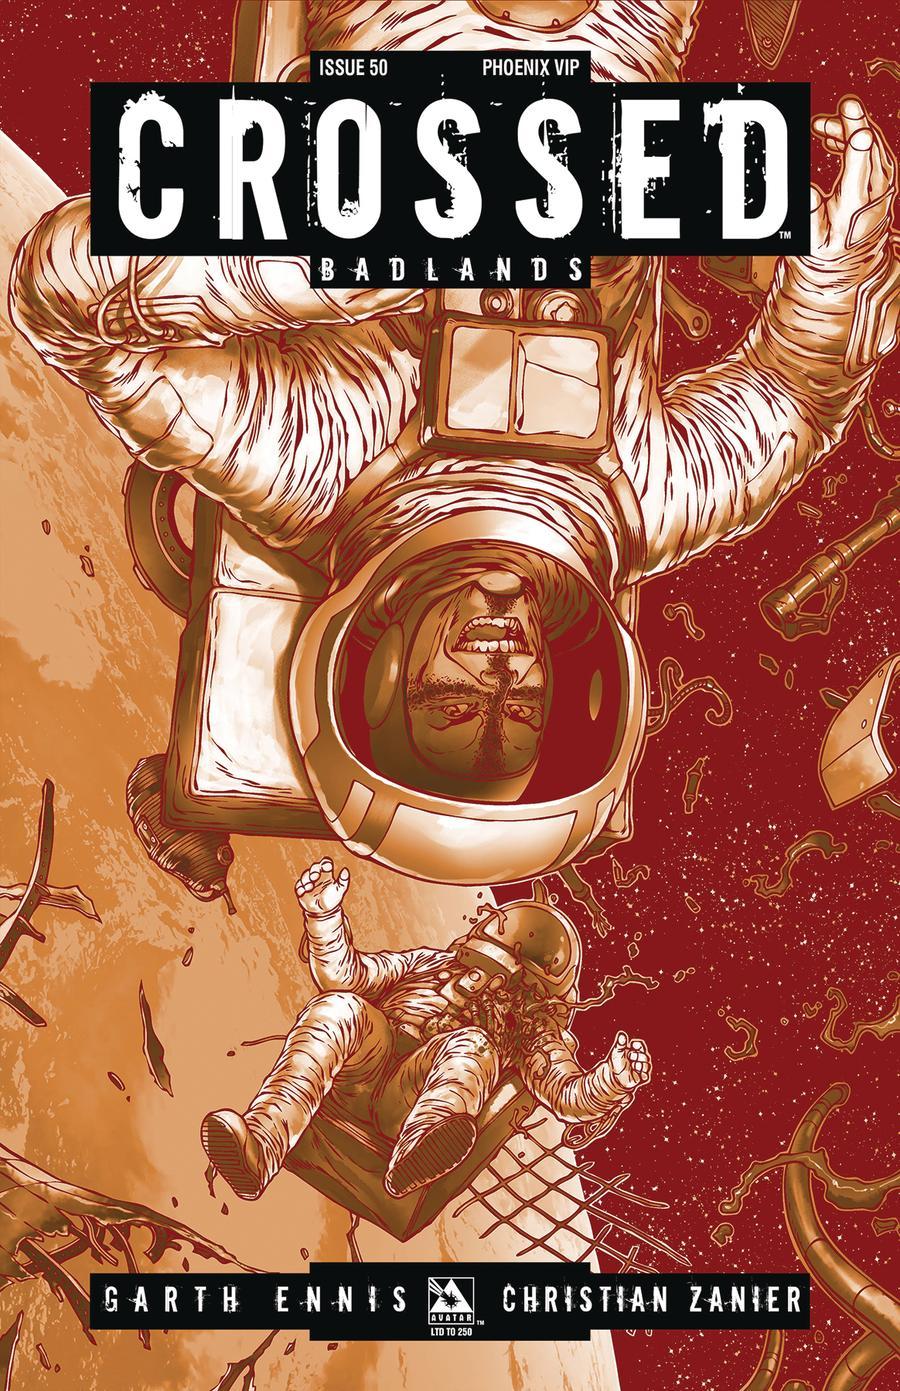 Crossed Badlands #50 Cover X Phoenix VIP Cover